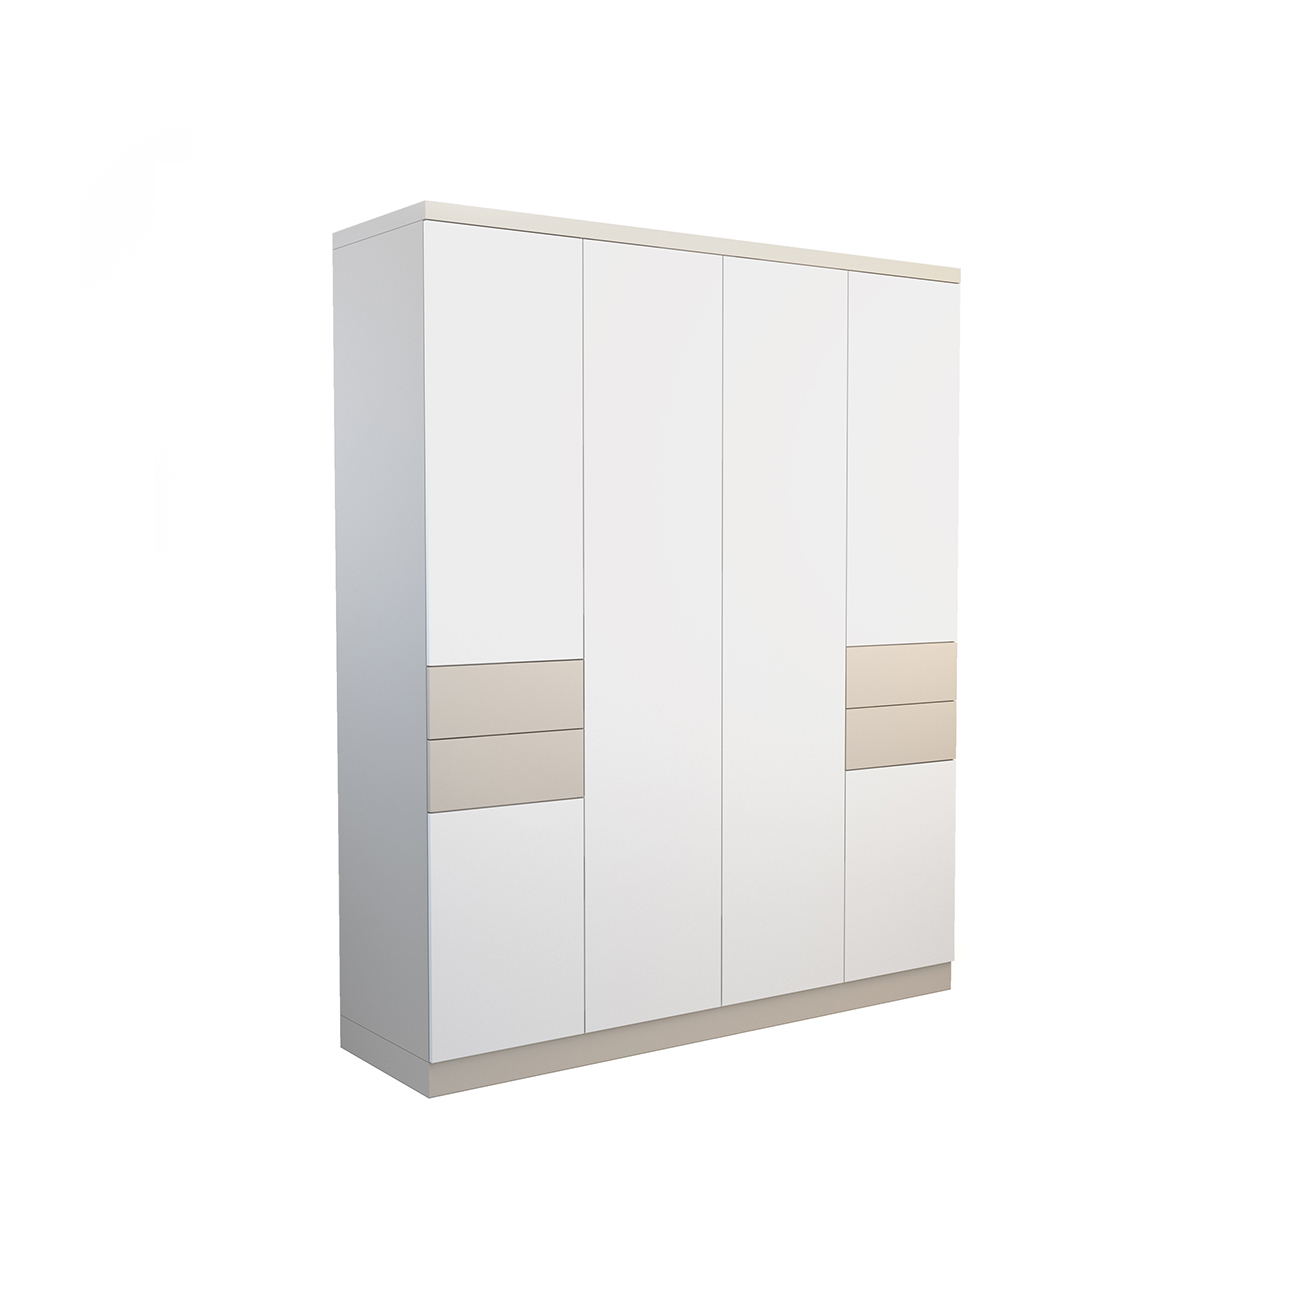 Шкаф galata soft (olhause) серый 200x240x60 см.